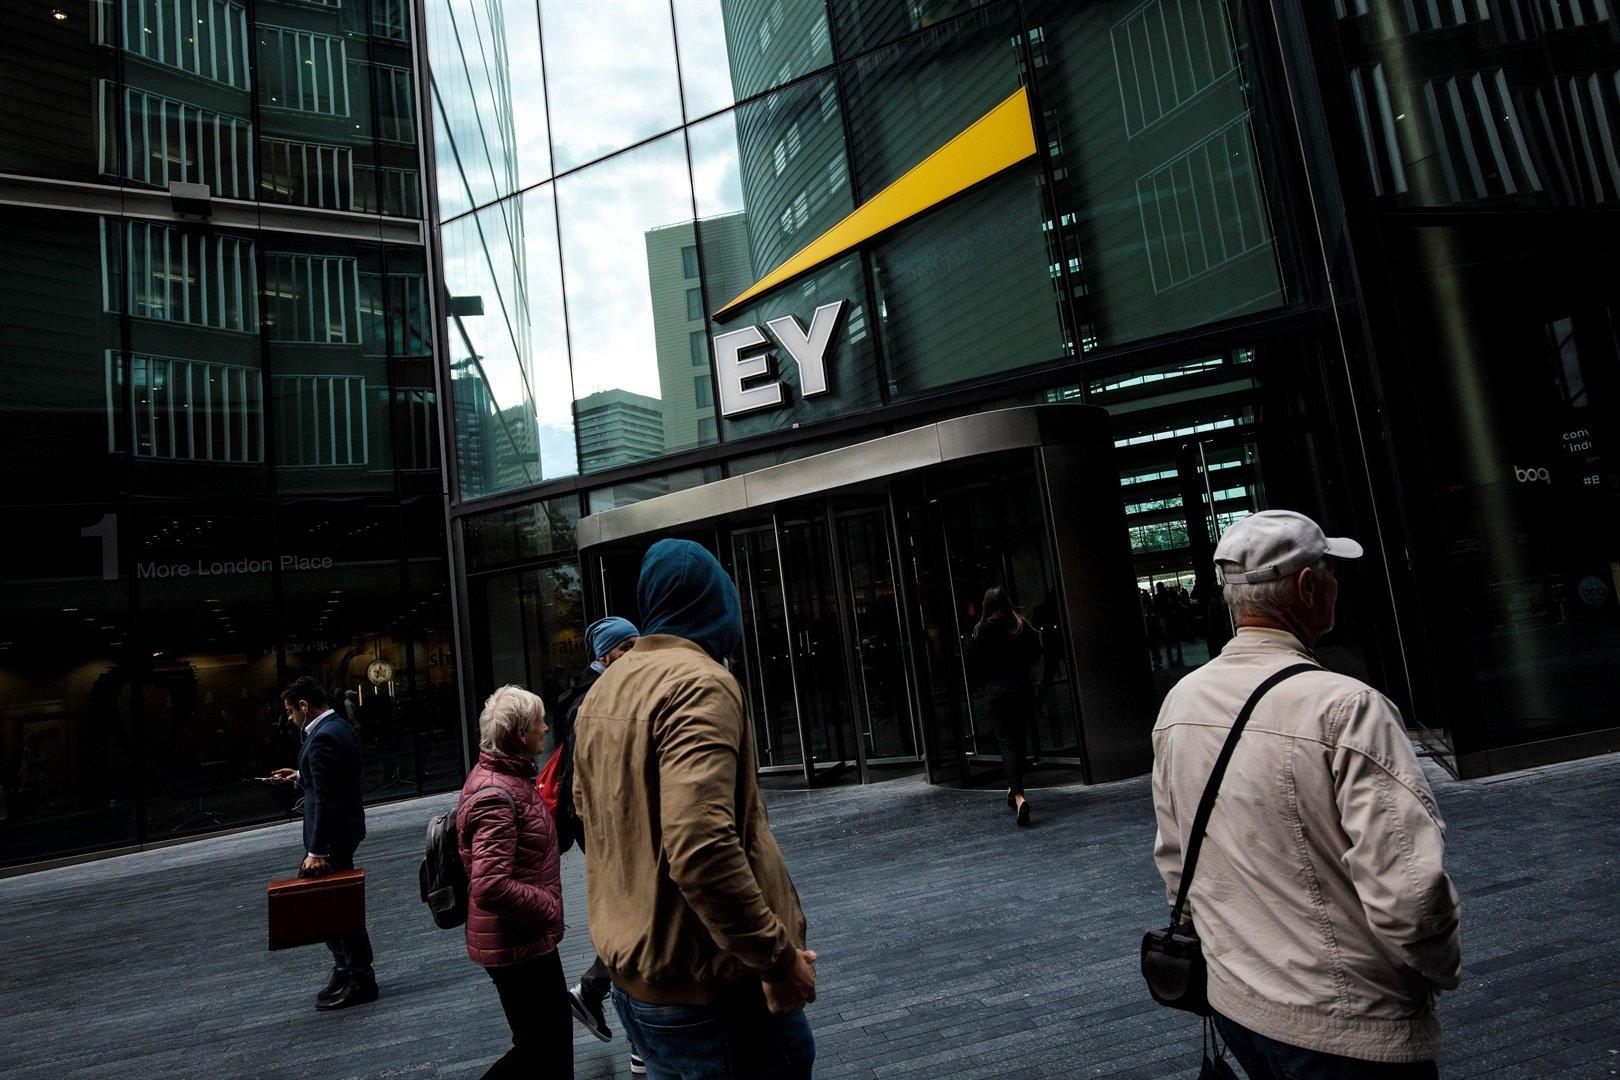 EY Centre by fjmt studio - Architizer